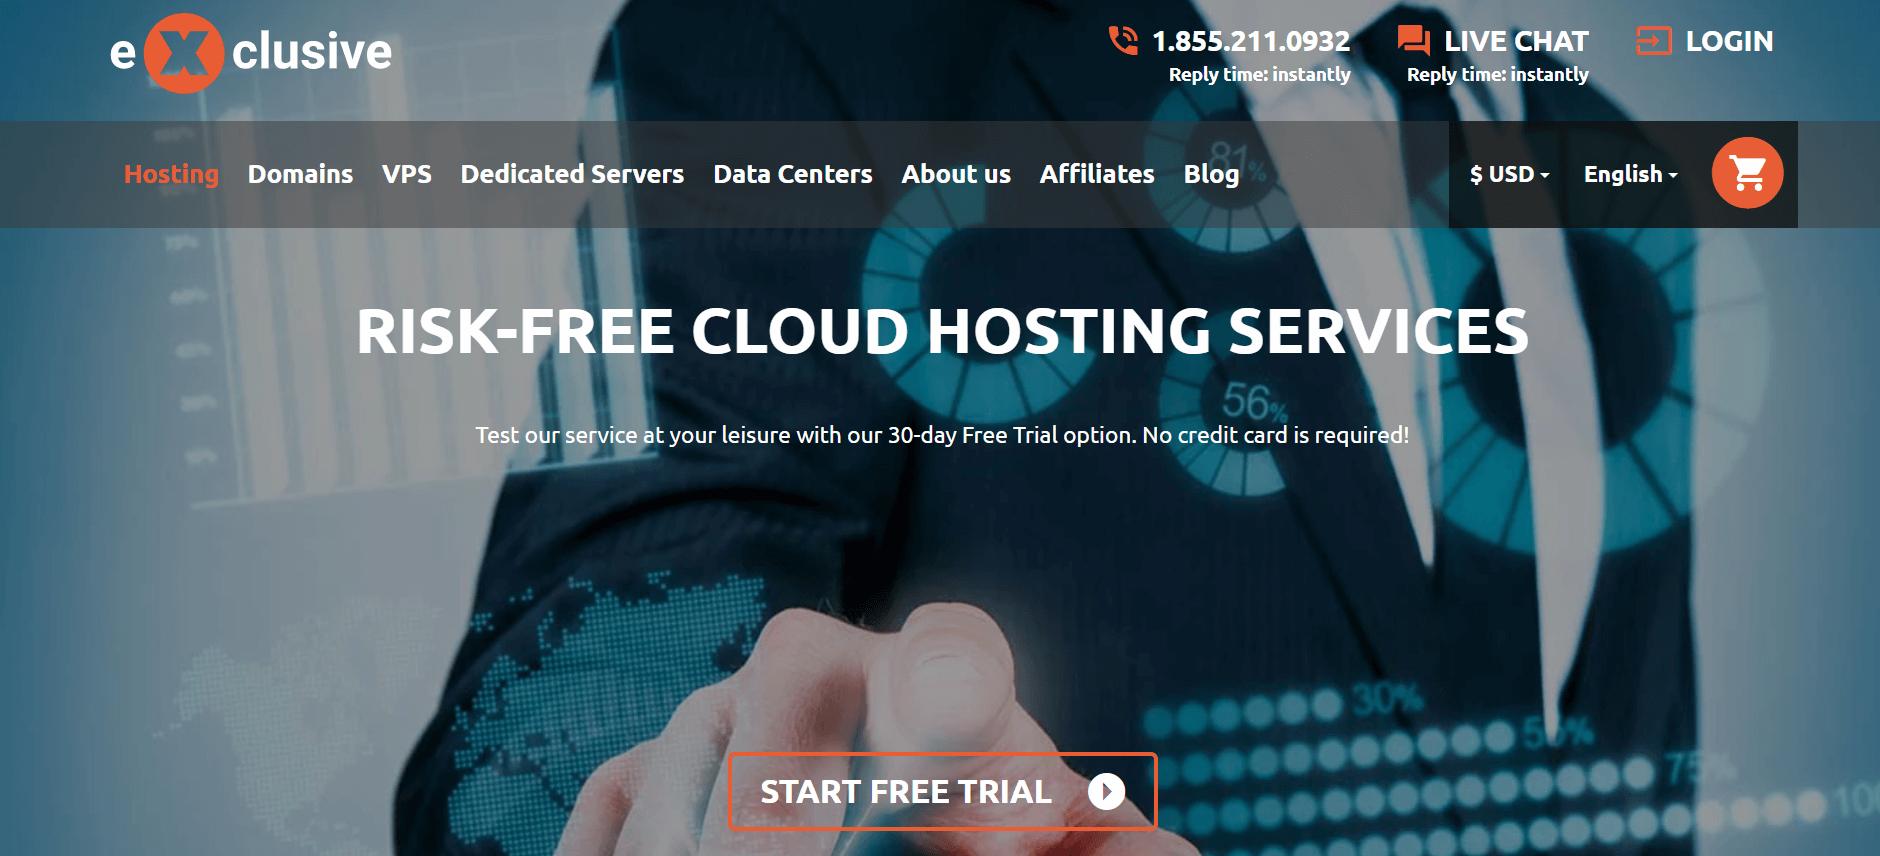 exclusive web hosting free trial